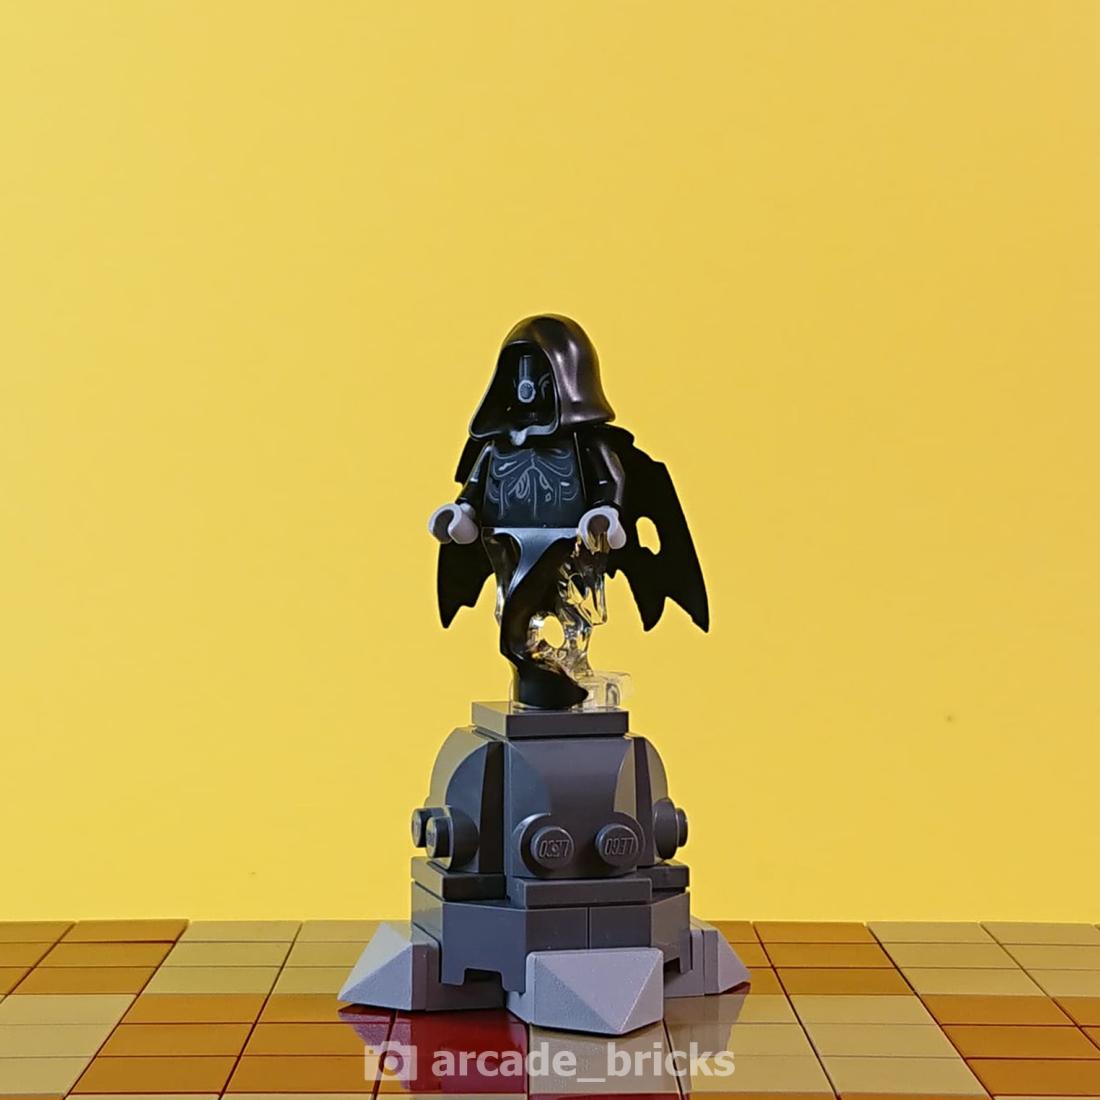 arcade_bricks_chess_hp_6_evil_pawn